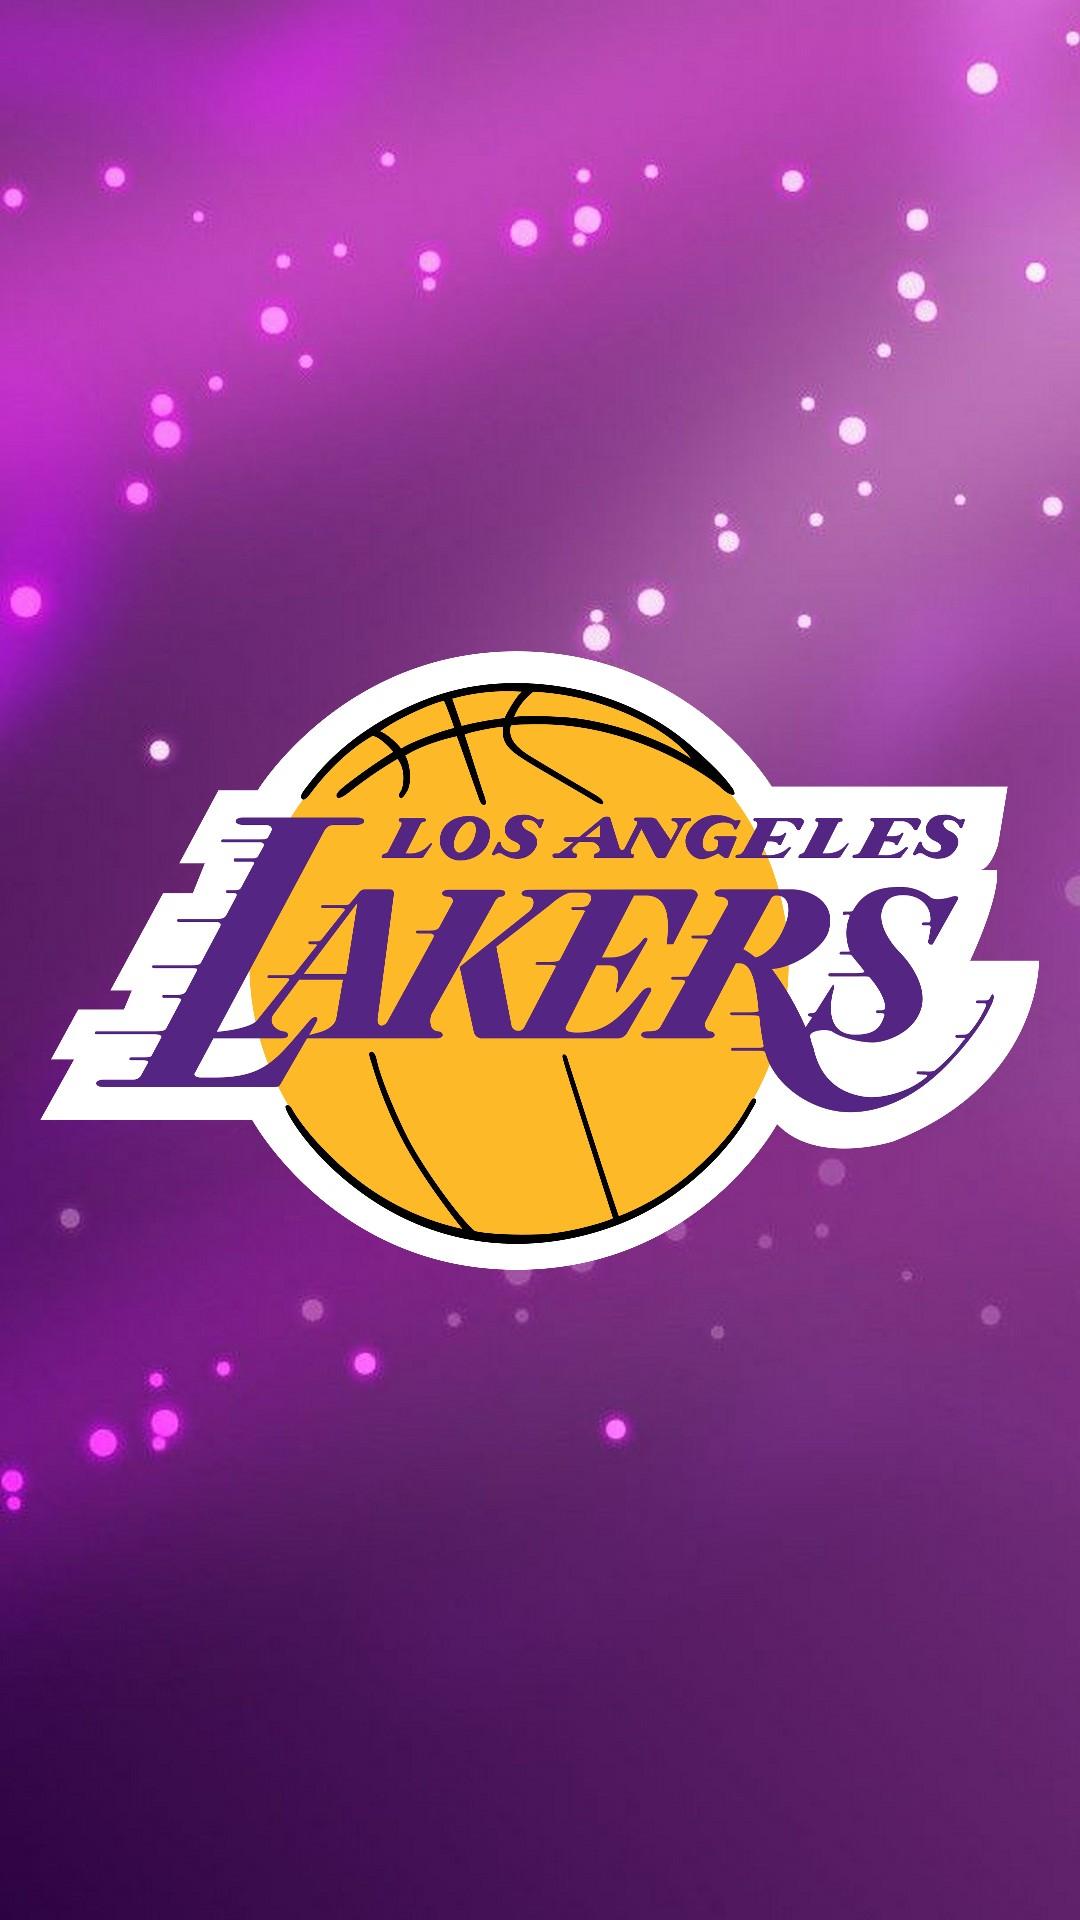 Los Angeles Lakers iPhone Wallpaper Lock Screen   2020 NBA iPhone 1080x1920